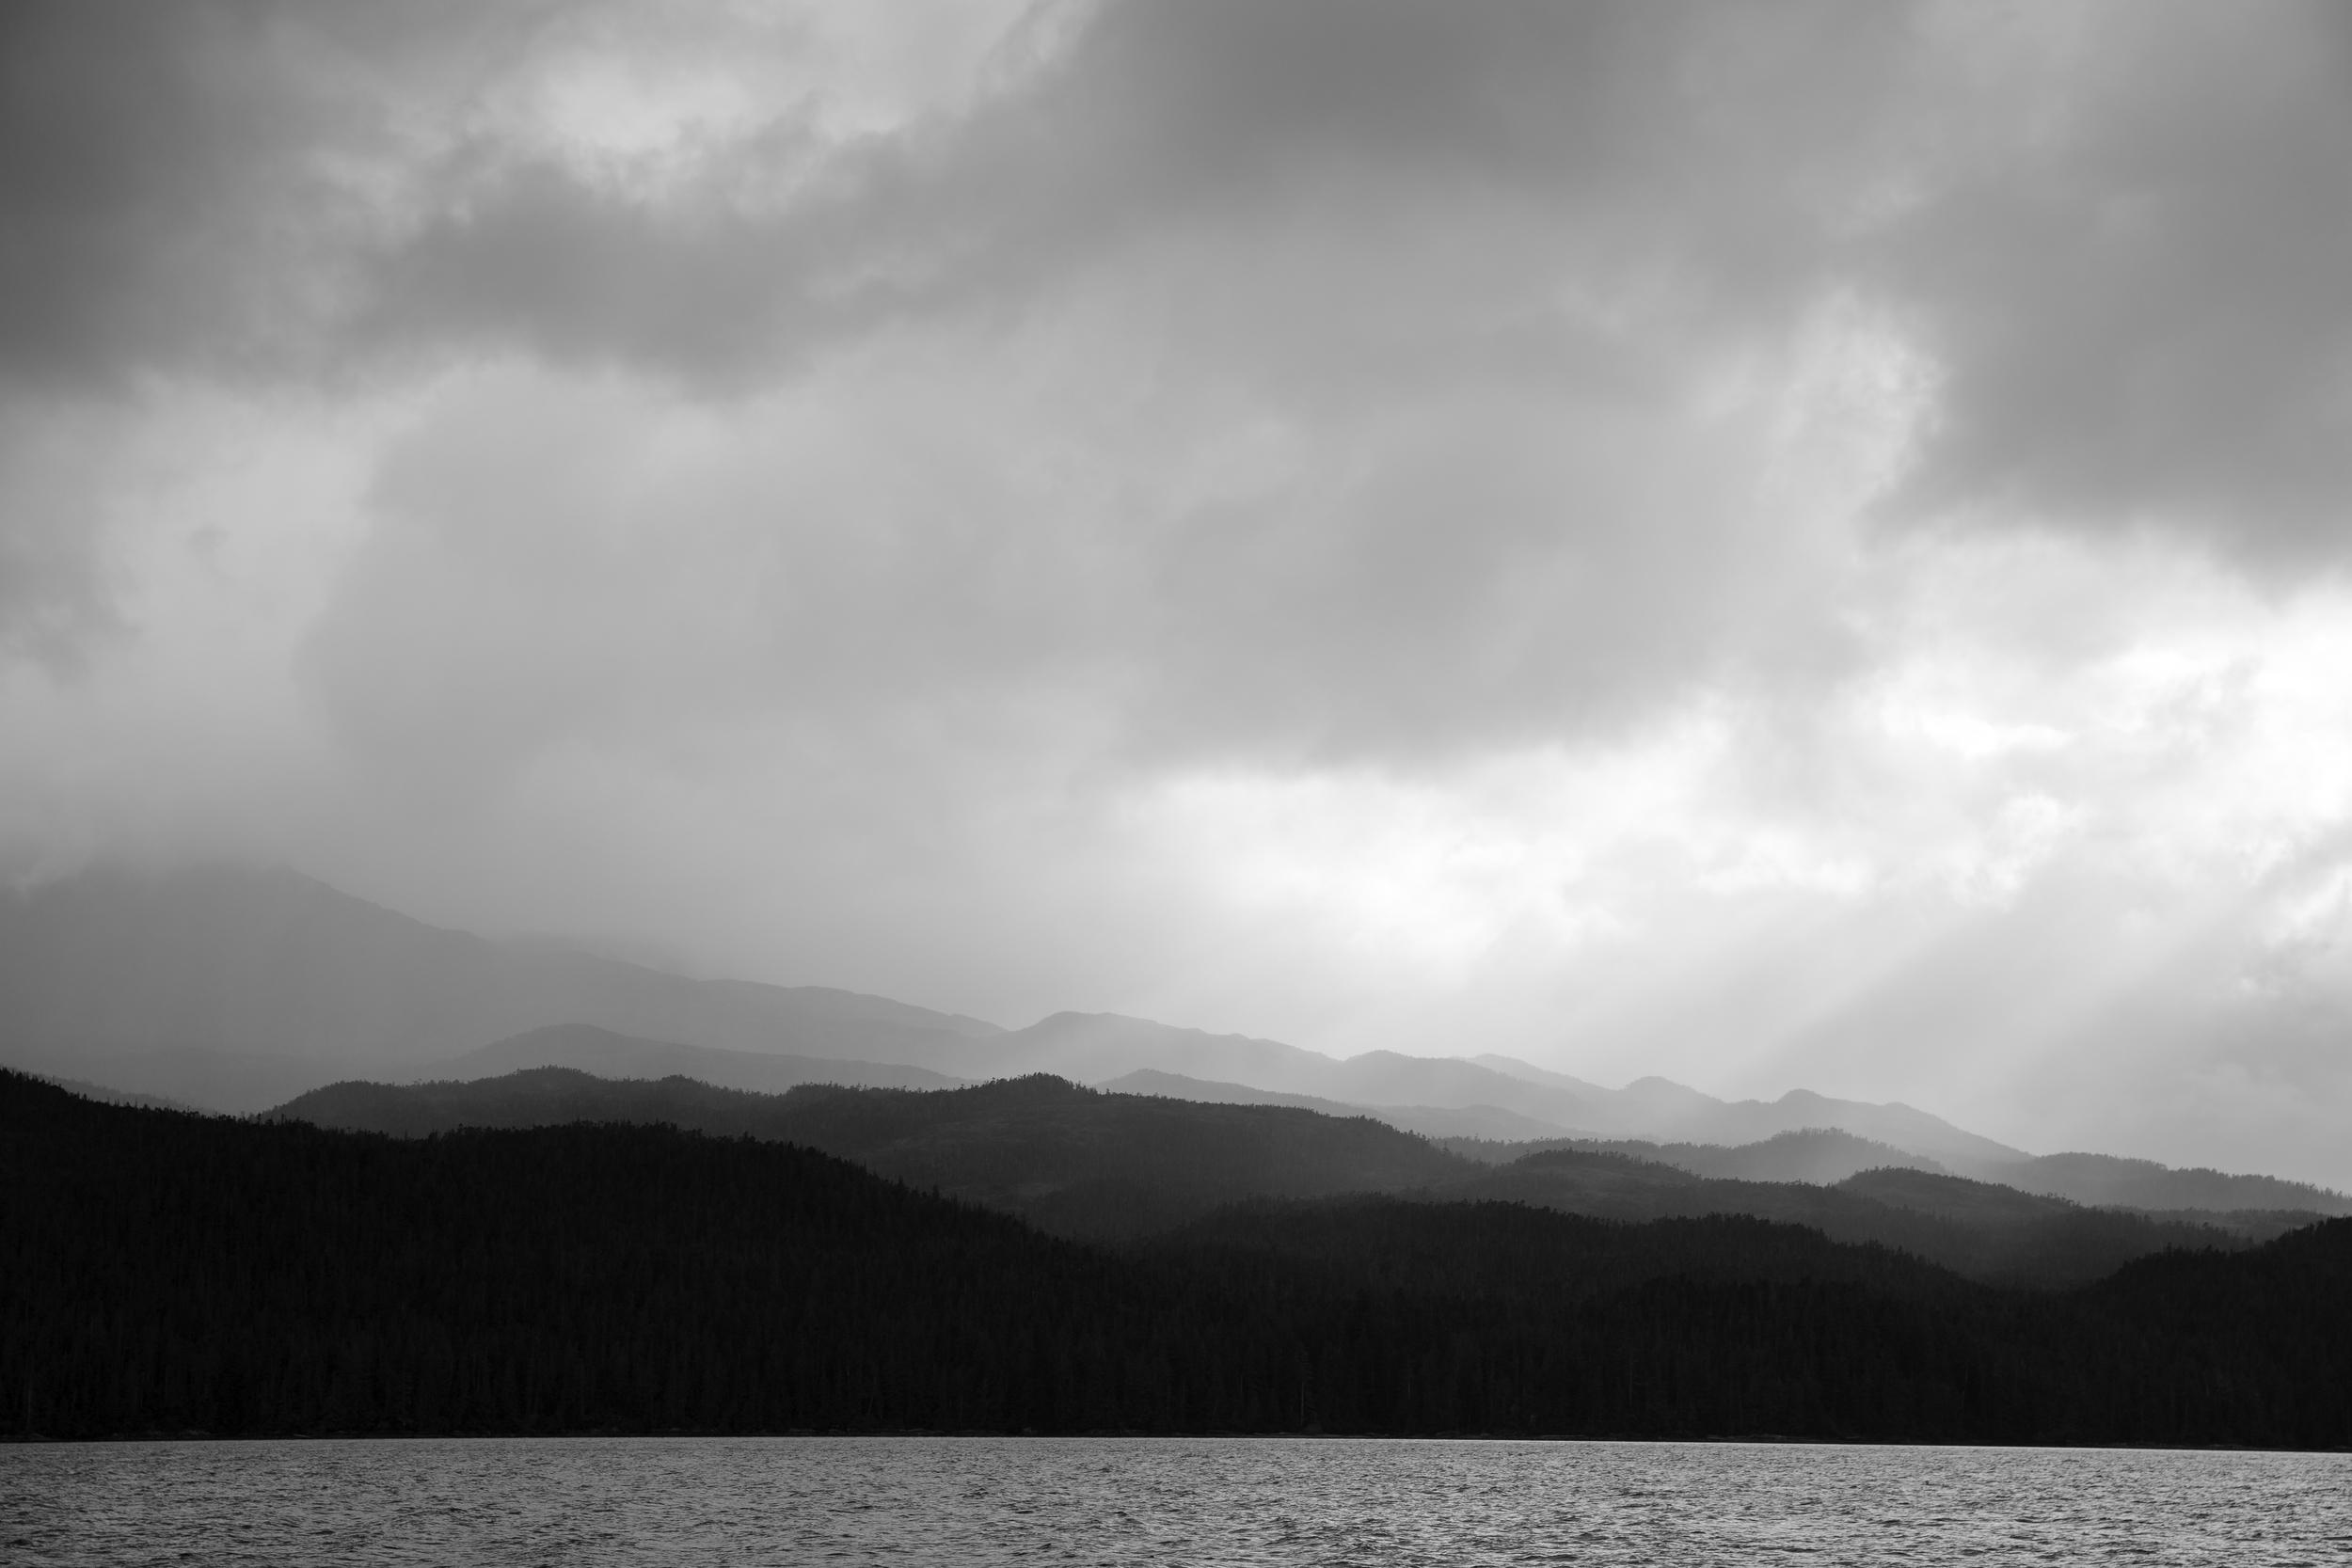 Calvert Island basks in coastal rains and the cloud dance of late evening light.